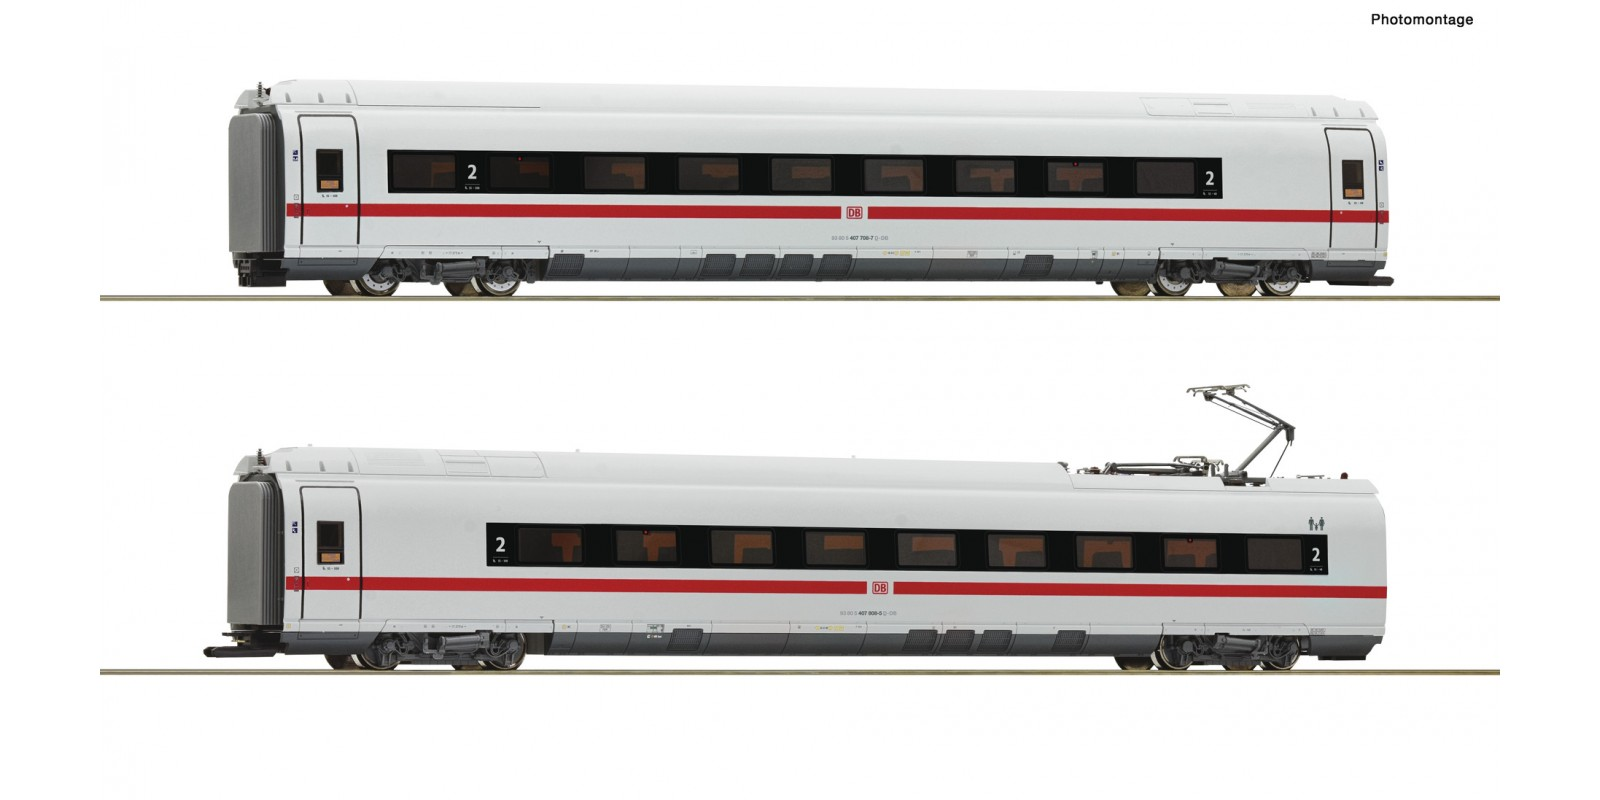 RO78097 2 piece set: Intermediate coaches class 407